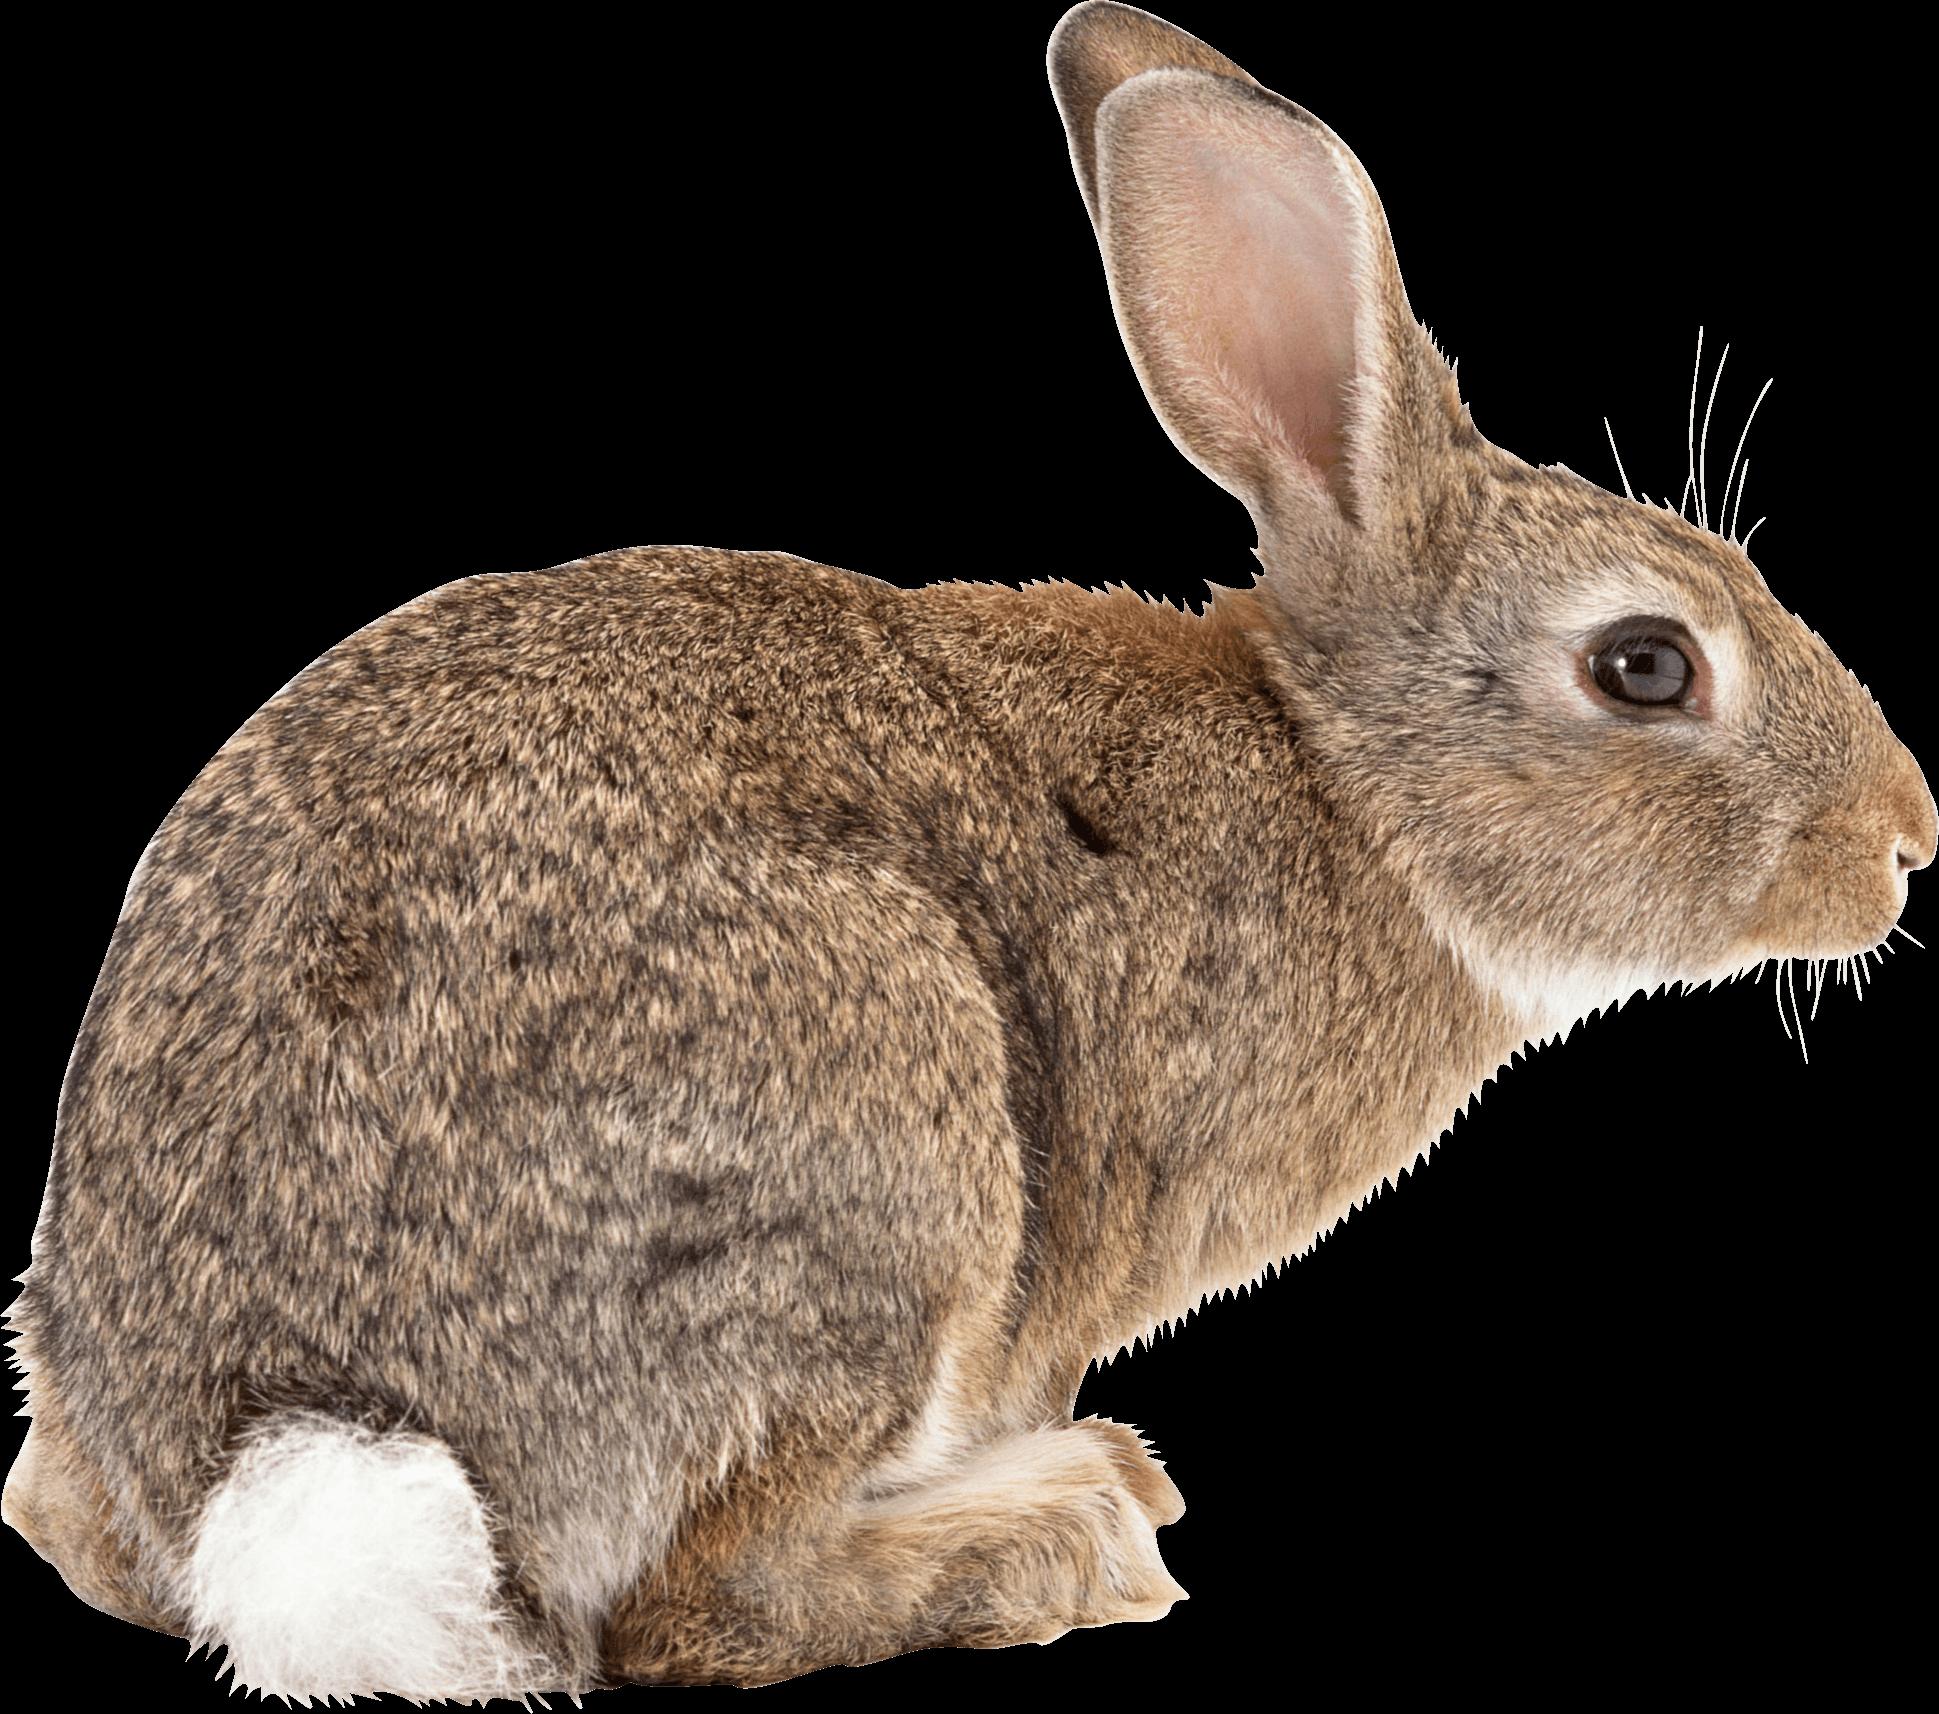 Rabbit PNG - 2862